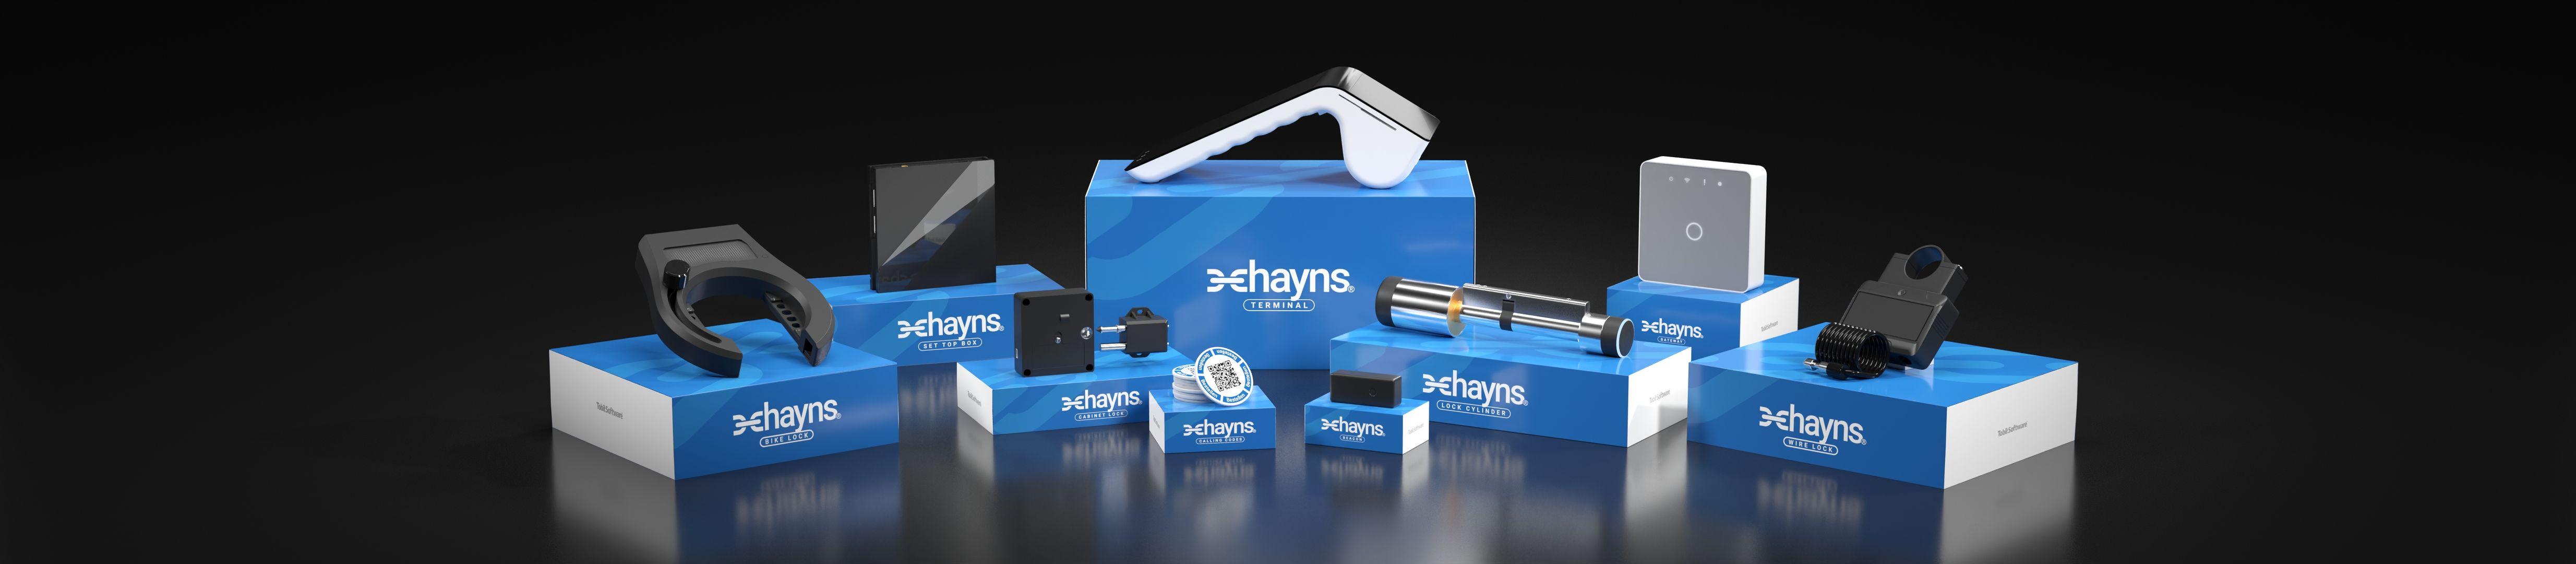 chayns® Things